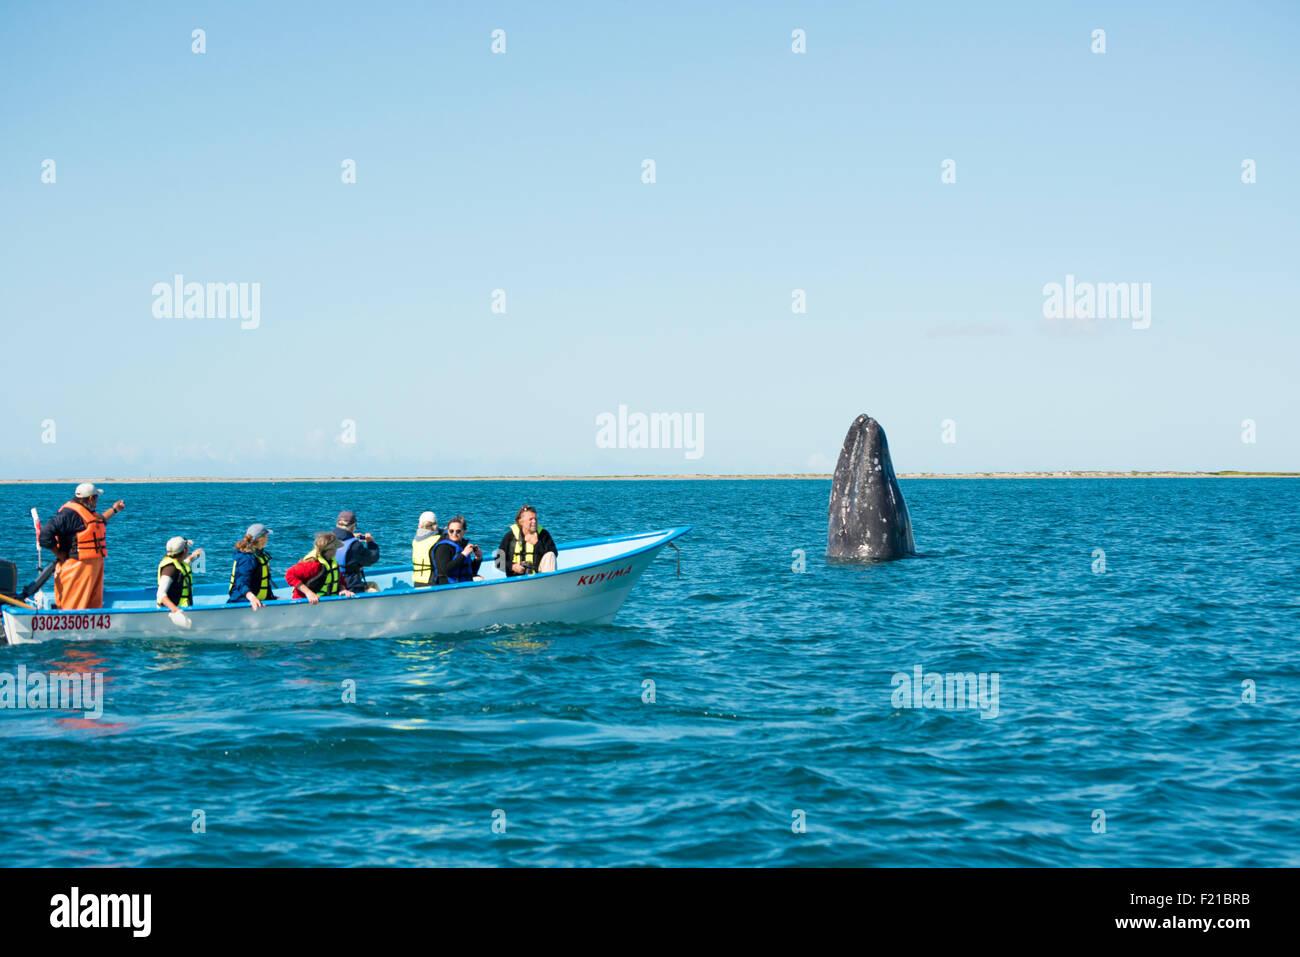 Mexico. San Ignacio Lagoon. Whale spyhopping while tourists watch. - Stock Image